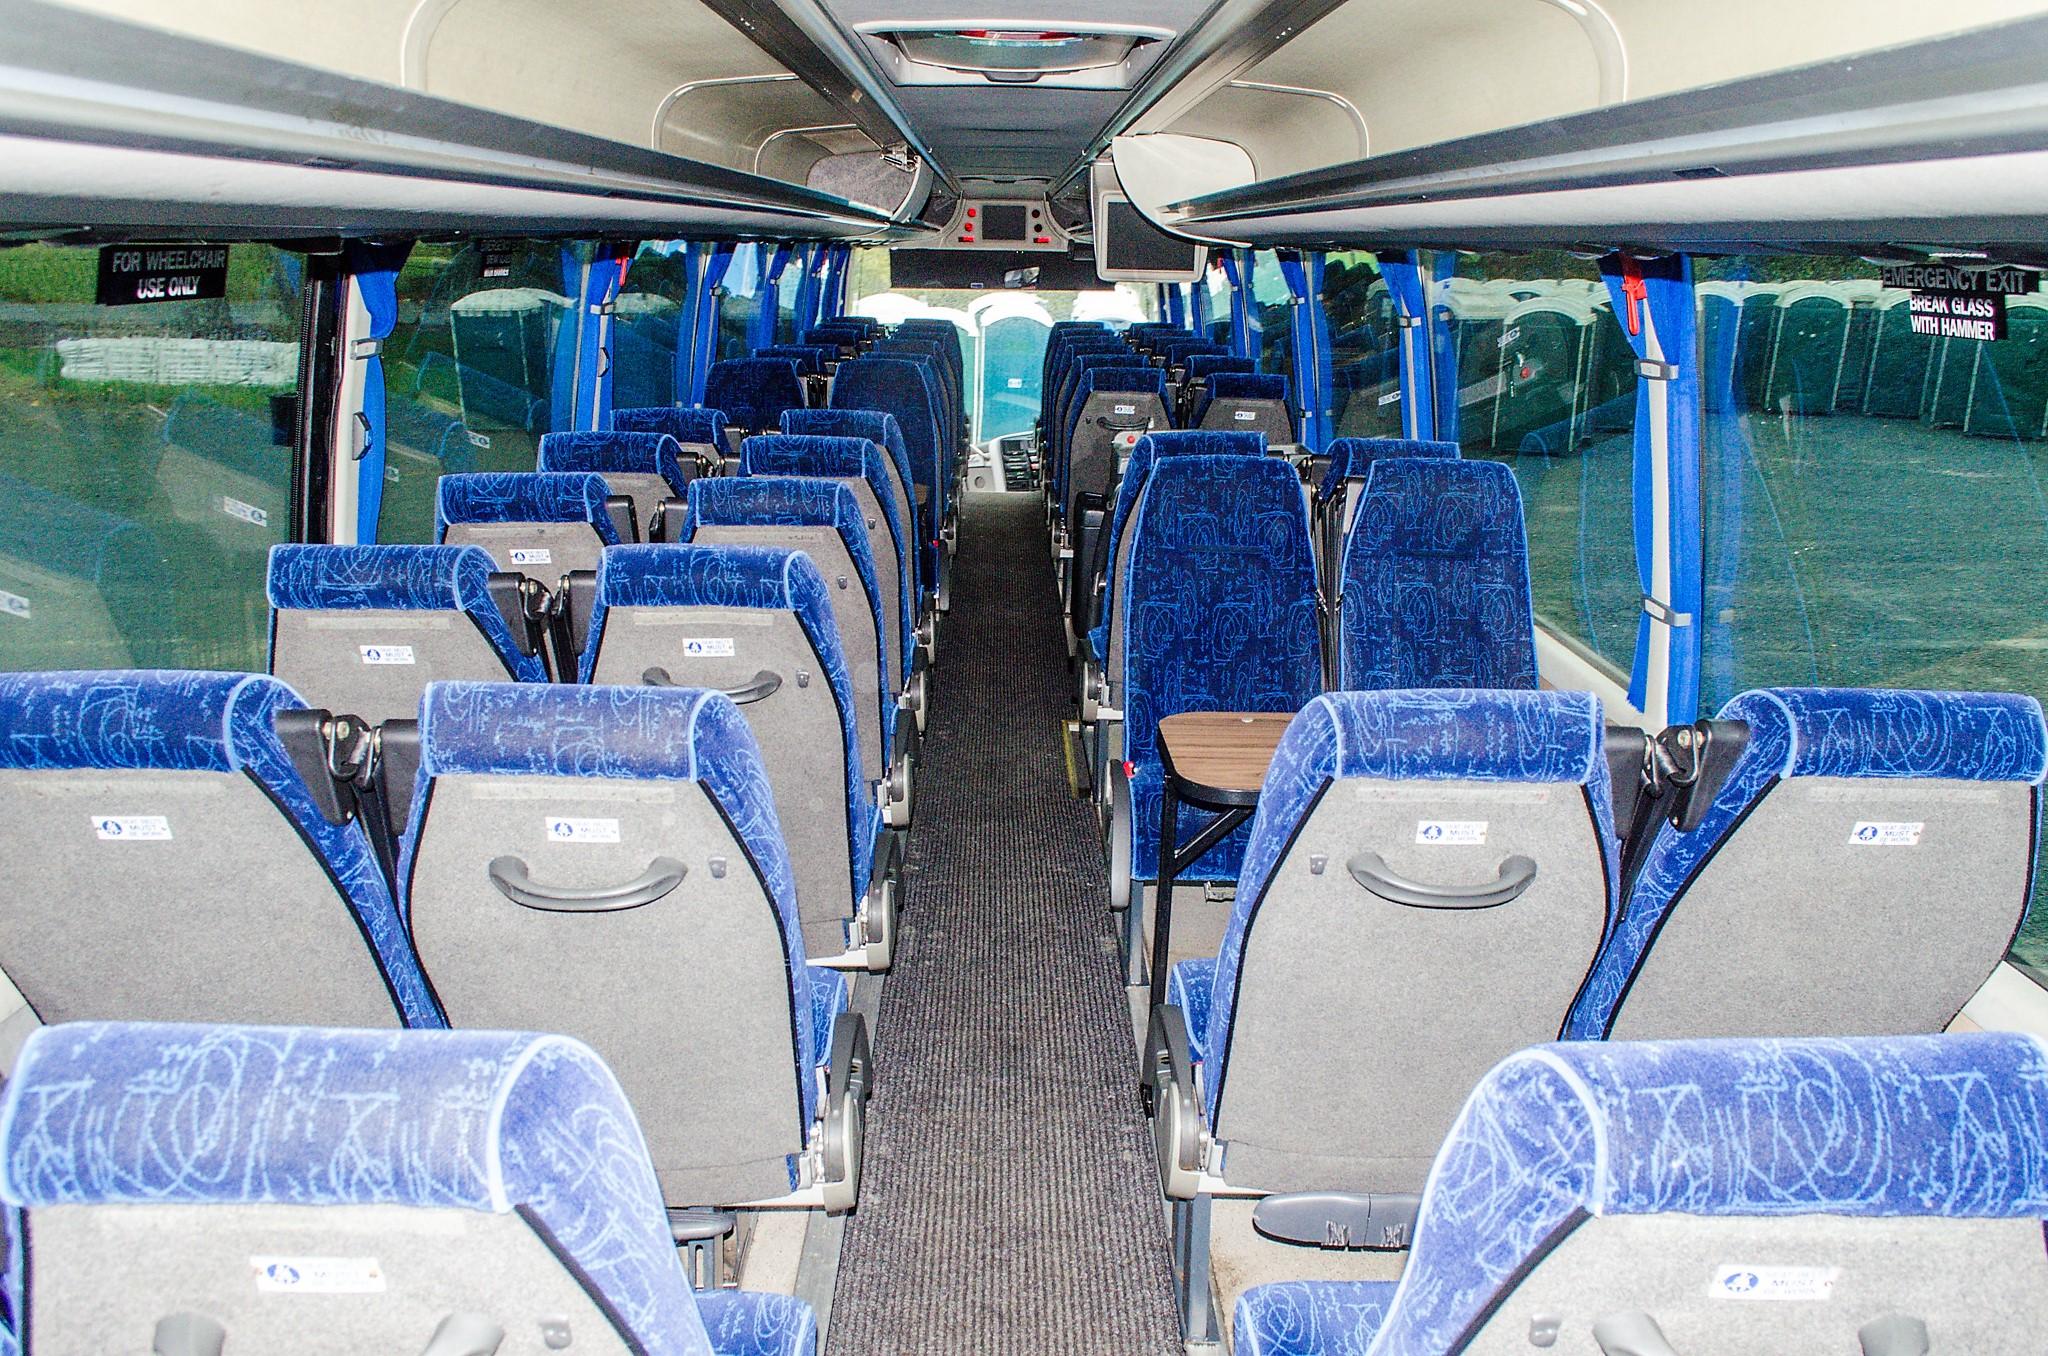 MAN F2000 Beulas Aura 54 seat luxury coach Registration Number: KC08 KTC Date of Registration: 30/ - Image 15 of 19